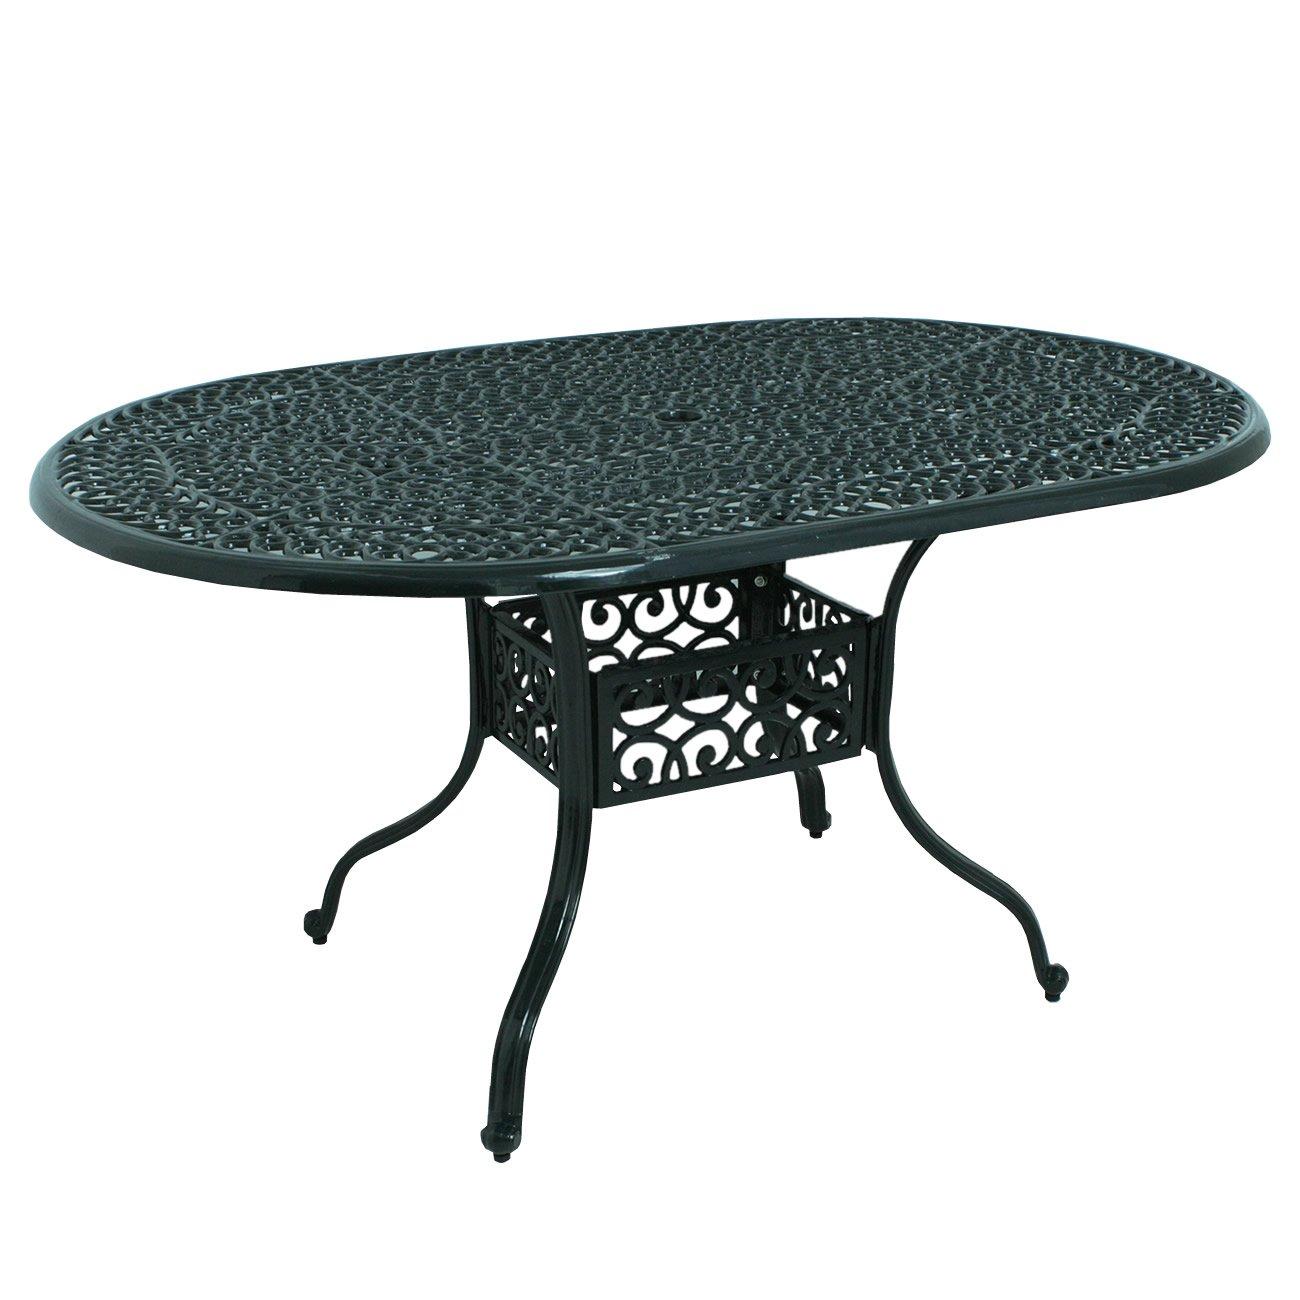 AHEART ガーデンテーブル ガーデンチェア アルミ 単品 イングリッシュガーデン SI 399 オーバルテーブル B07DMYGZ2D   オーバルテーブル